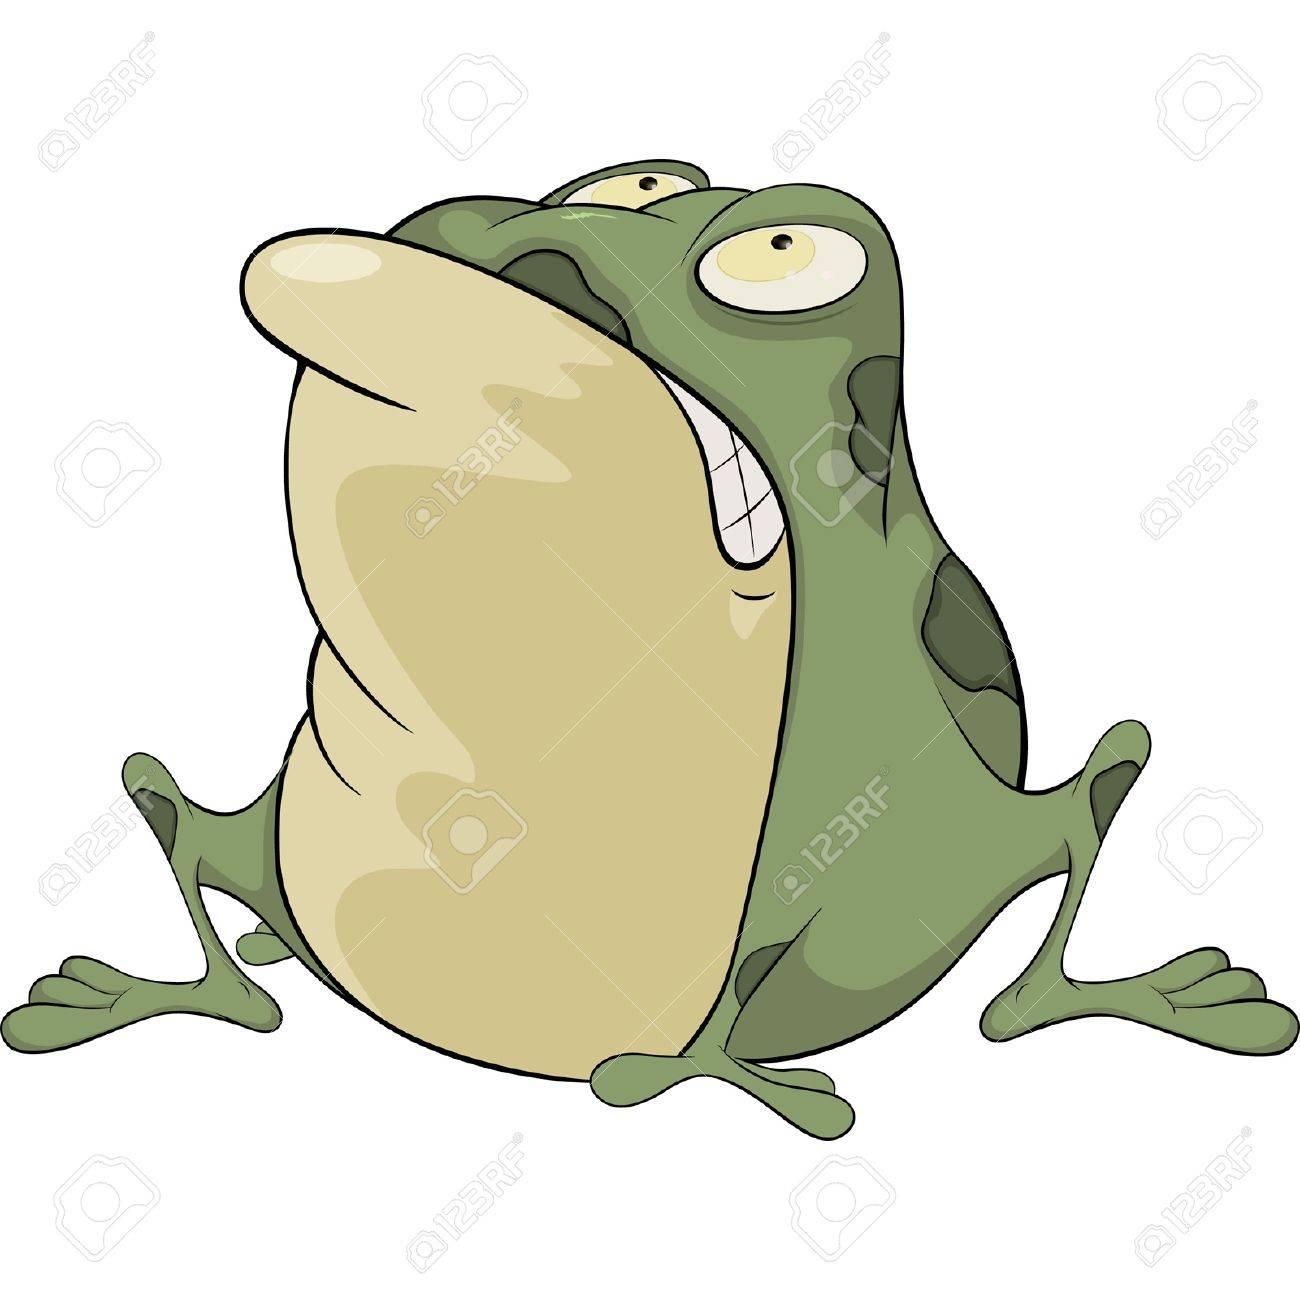 Crapaud Dessin le crapaud vert. dessin animé clip art libres de droits , vecteurs